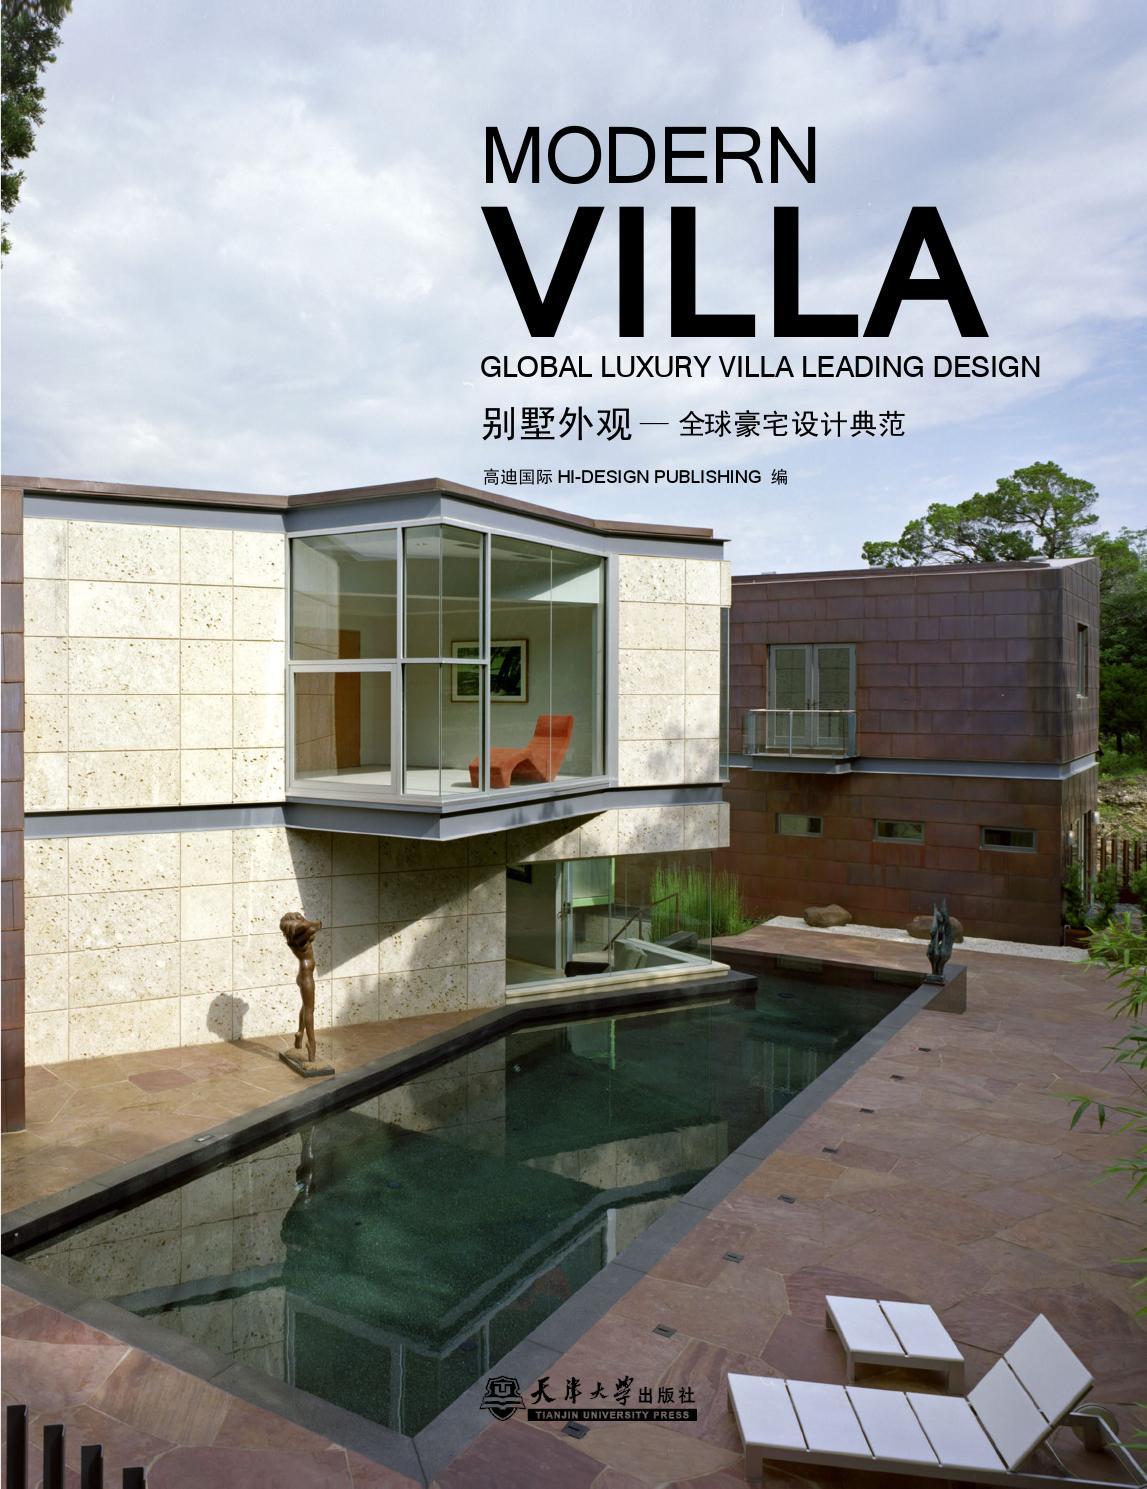 Modern villa global luxury villa leading design by hi for Villa interior designers ltd nairobi kenya